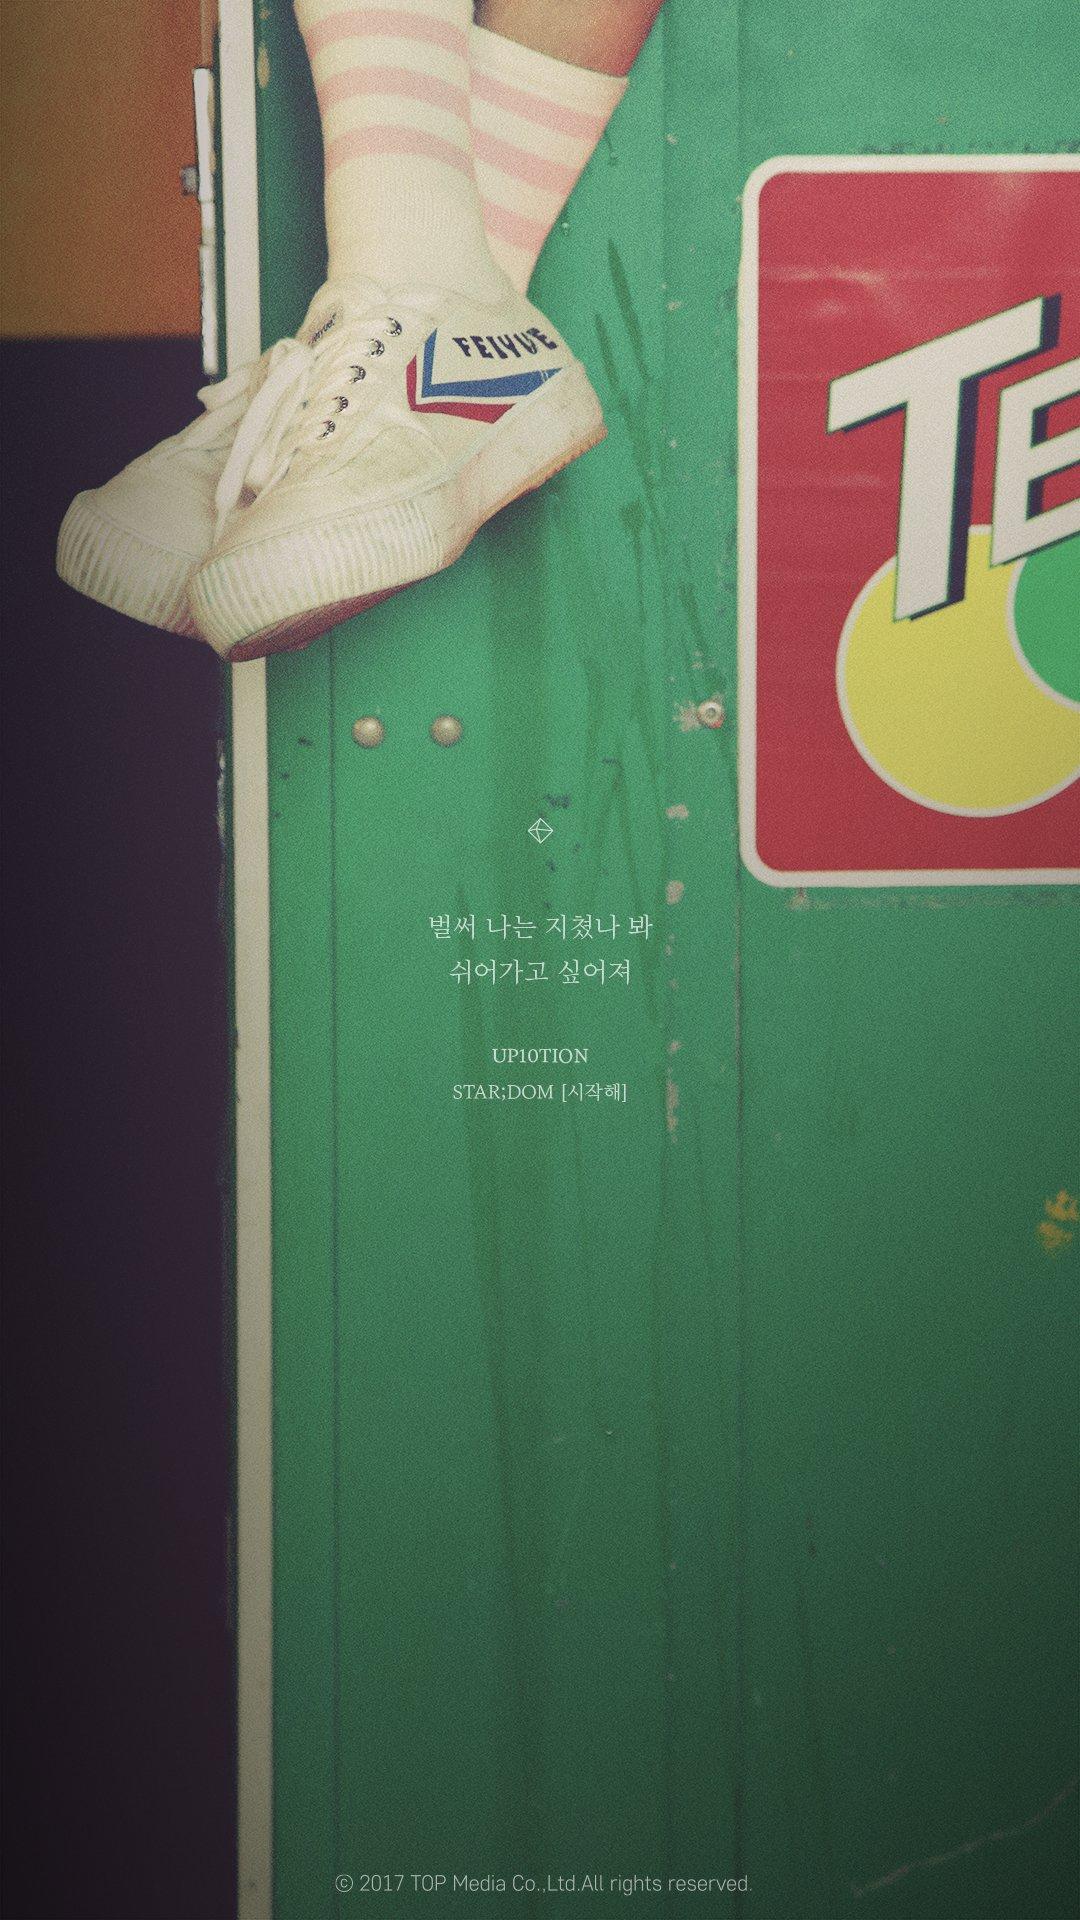 #UP10TION #STARDOM #시작해 #Runner TITLE SIGNPOST 170629 https://t.co/IZRexjv1xZ